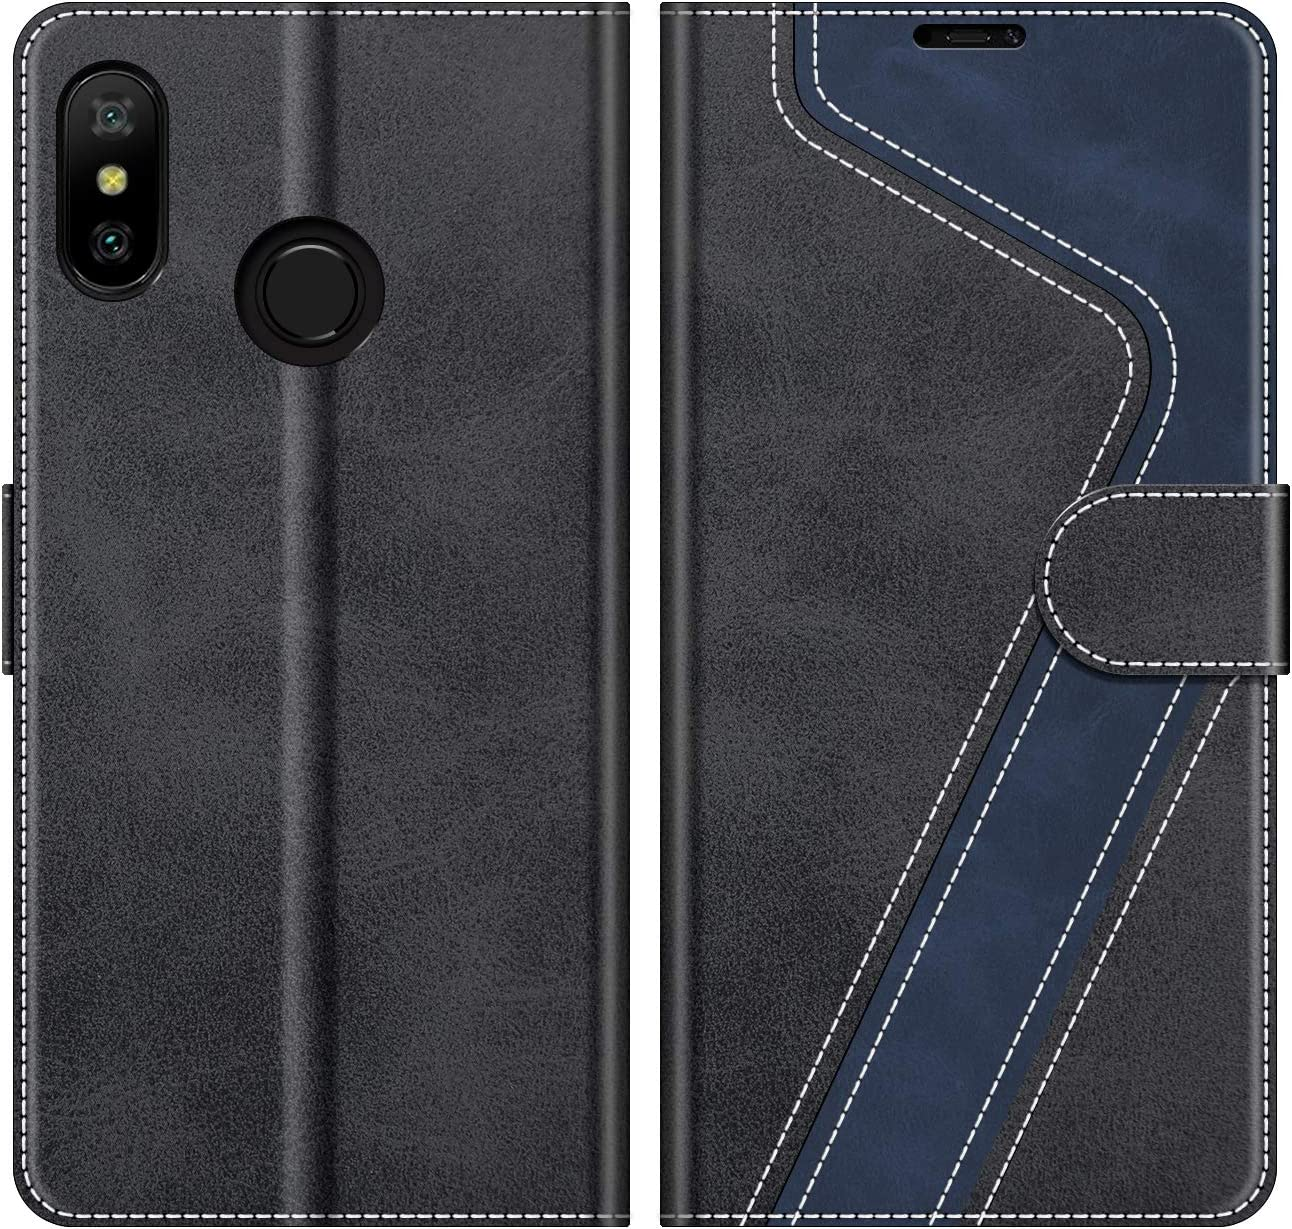 MOBESV Funda para Xiaomi Mi A2 Lite, Funda Libro Xiaomi Mi A2 Lite, Funda Móvil Xiaomi Mi A2 Lite Magnético Carcasa para Xiaomi Mi A2 Lite Funda con Tapa, Negro